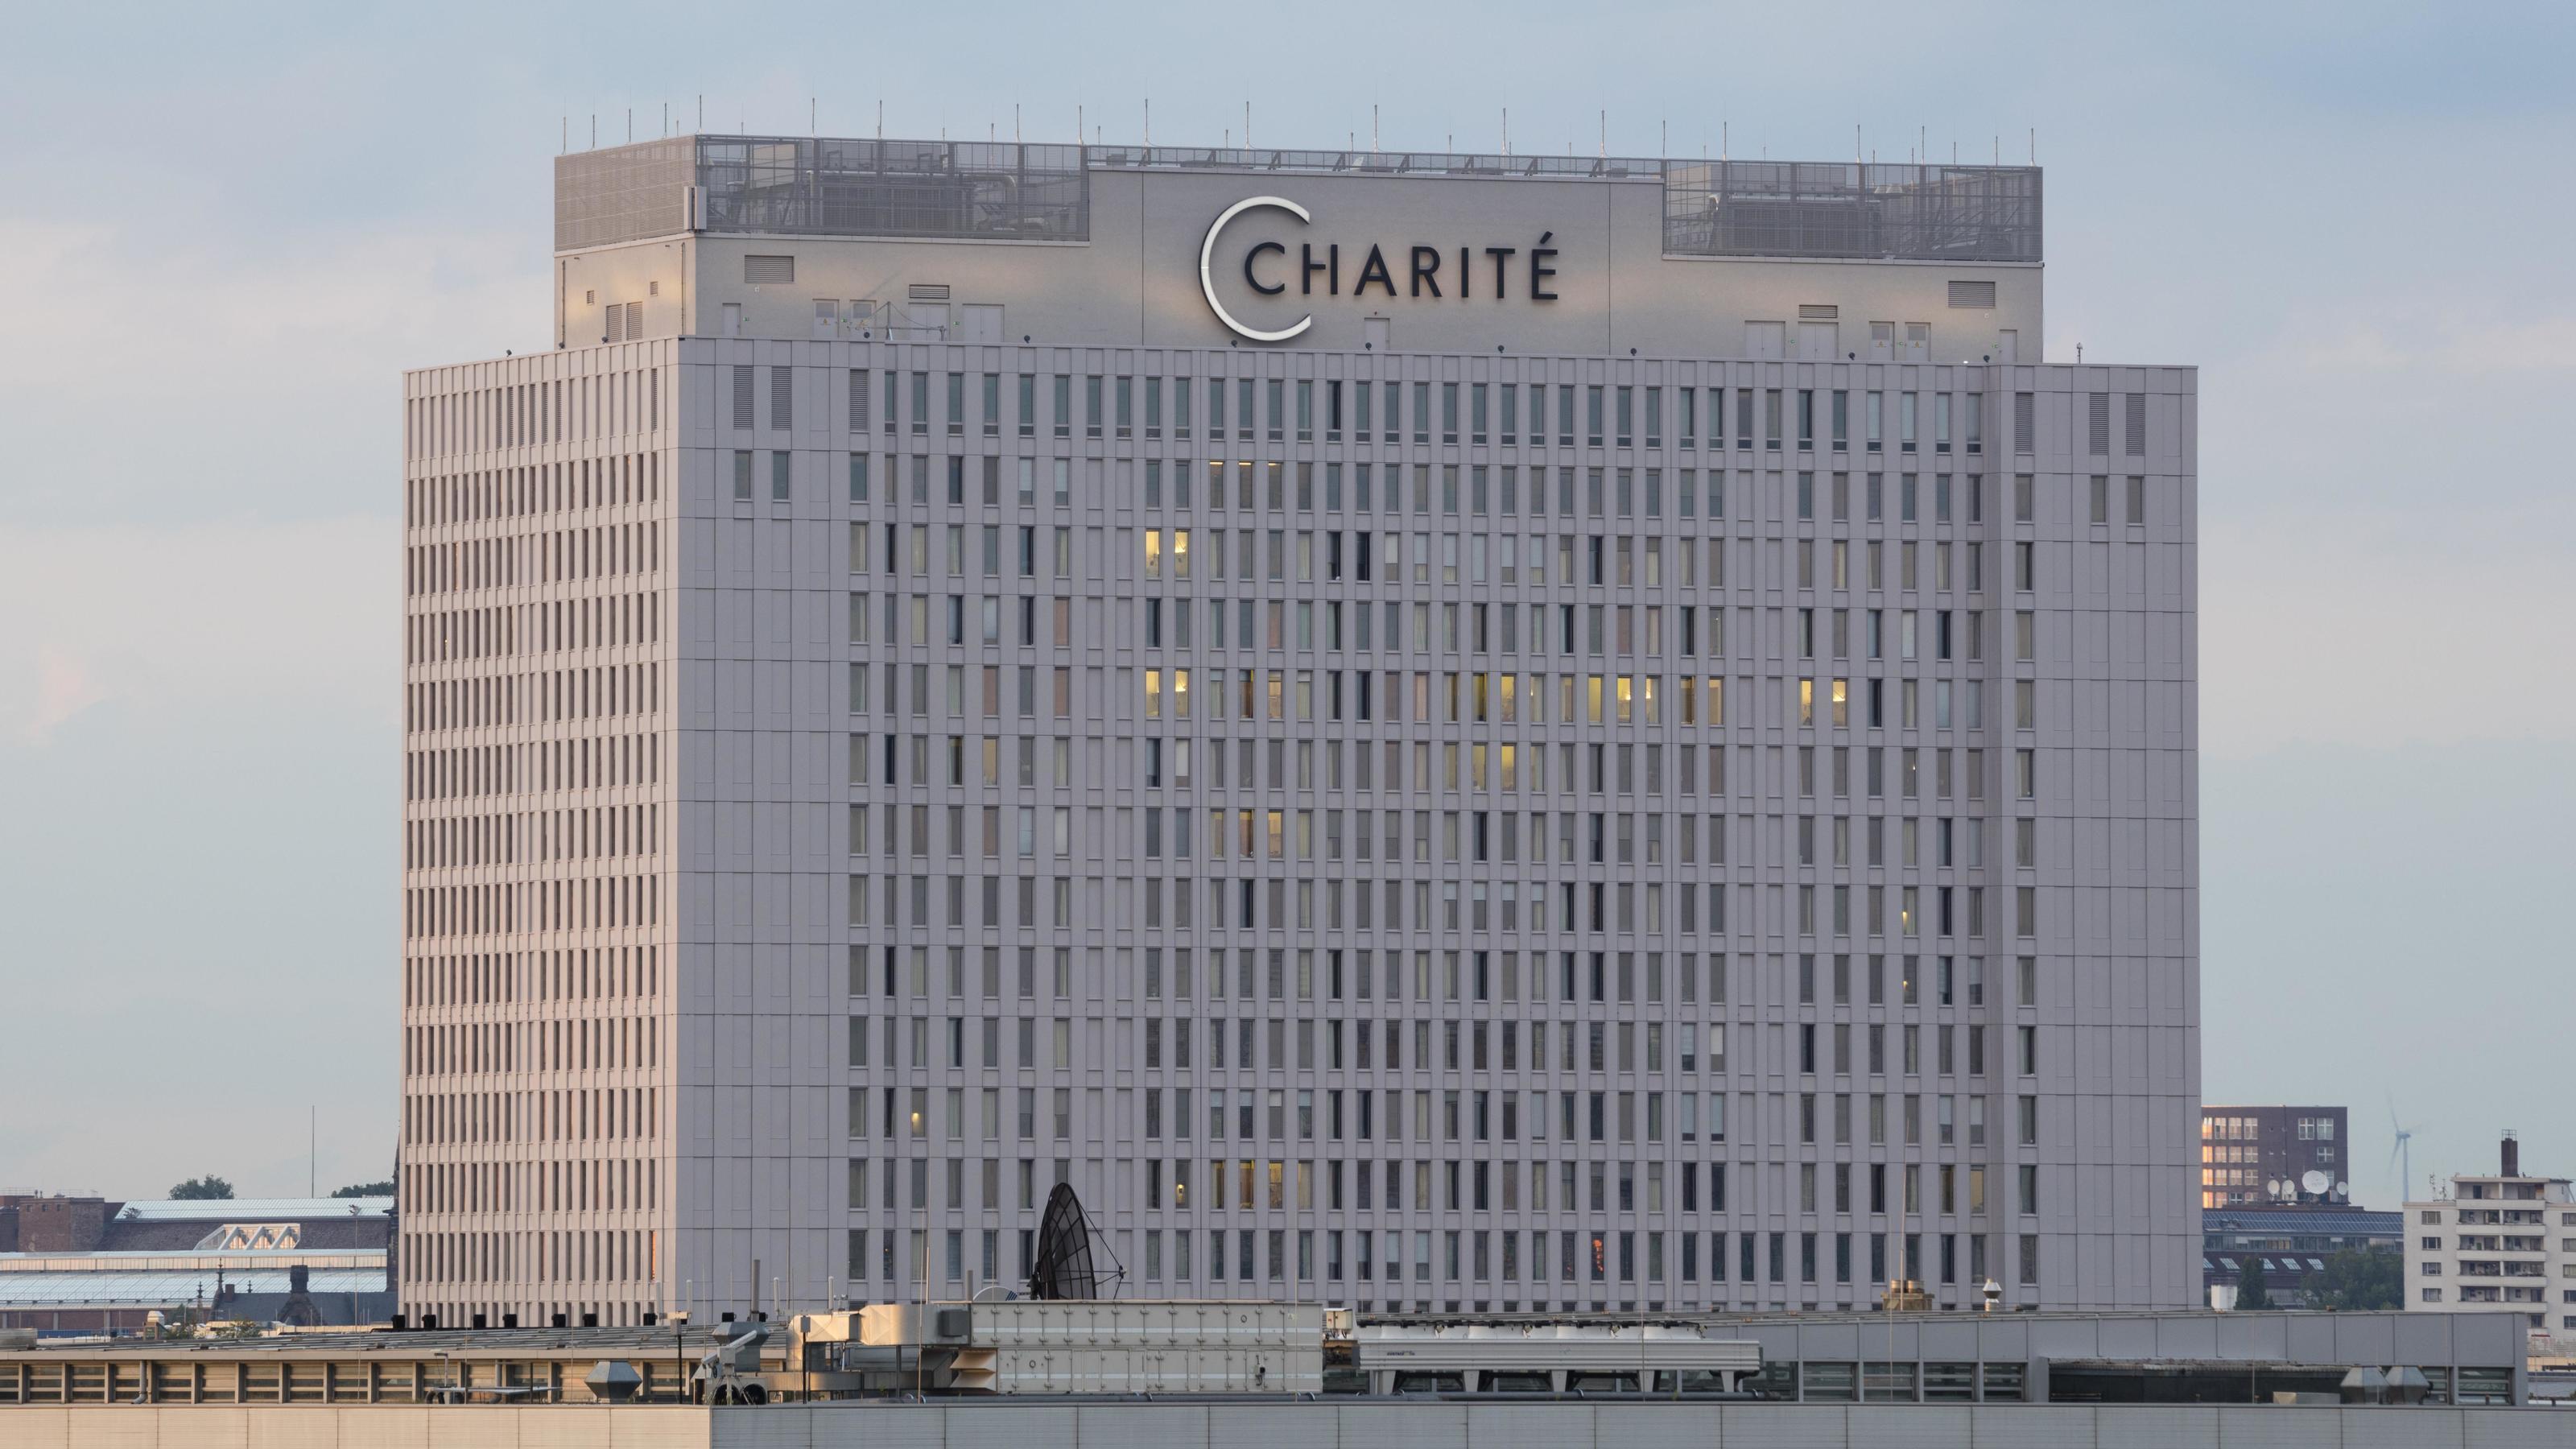 Berliner Charitee